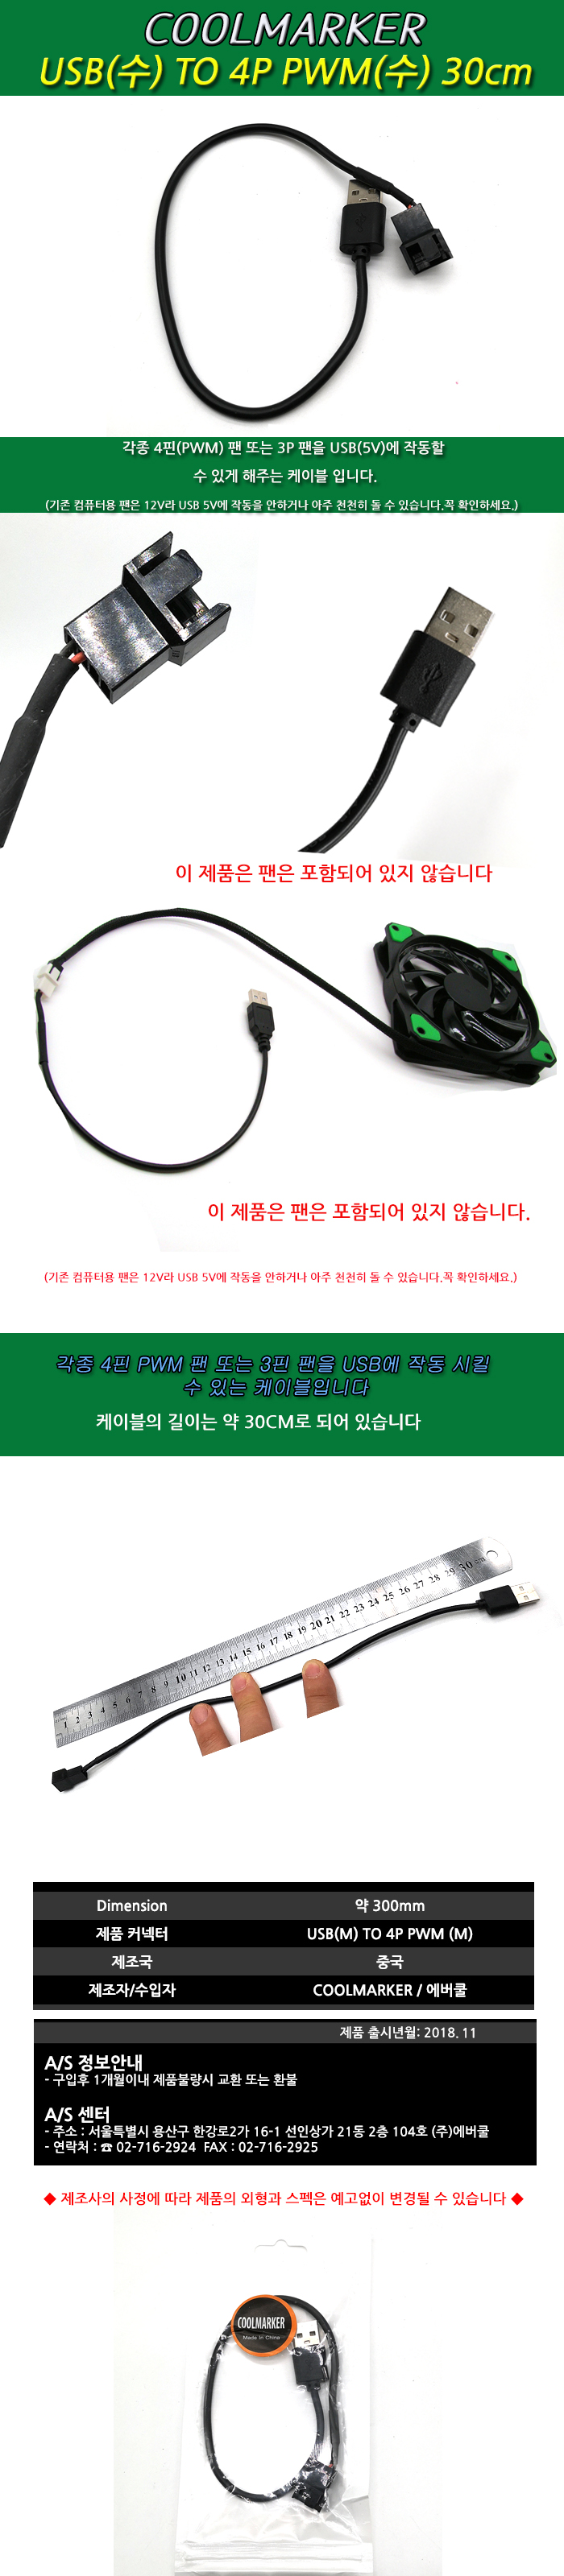 EVERCOOL COOLMARKER USB(수) TO 4P PWM(수) 30CM